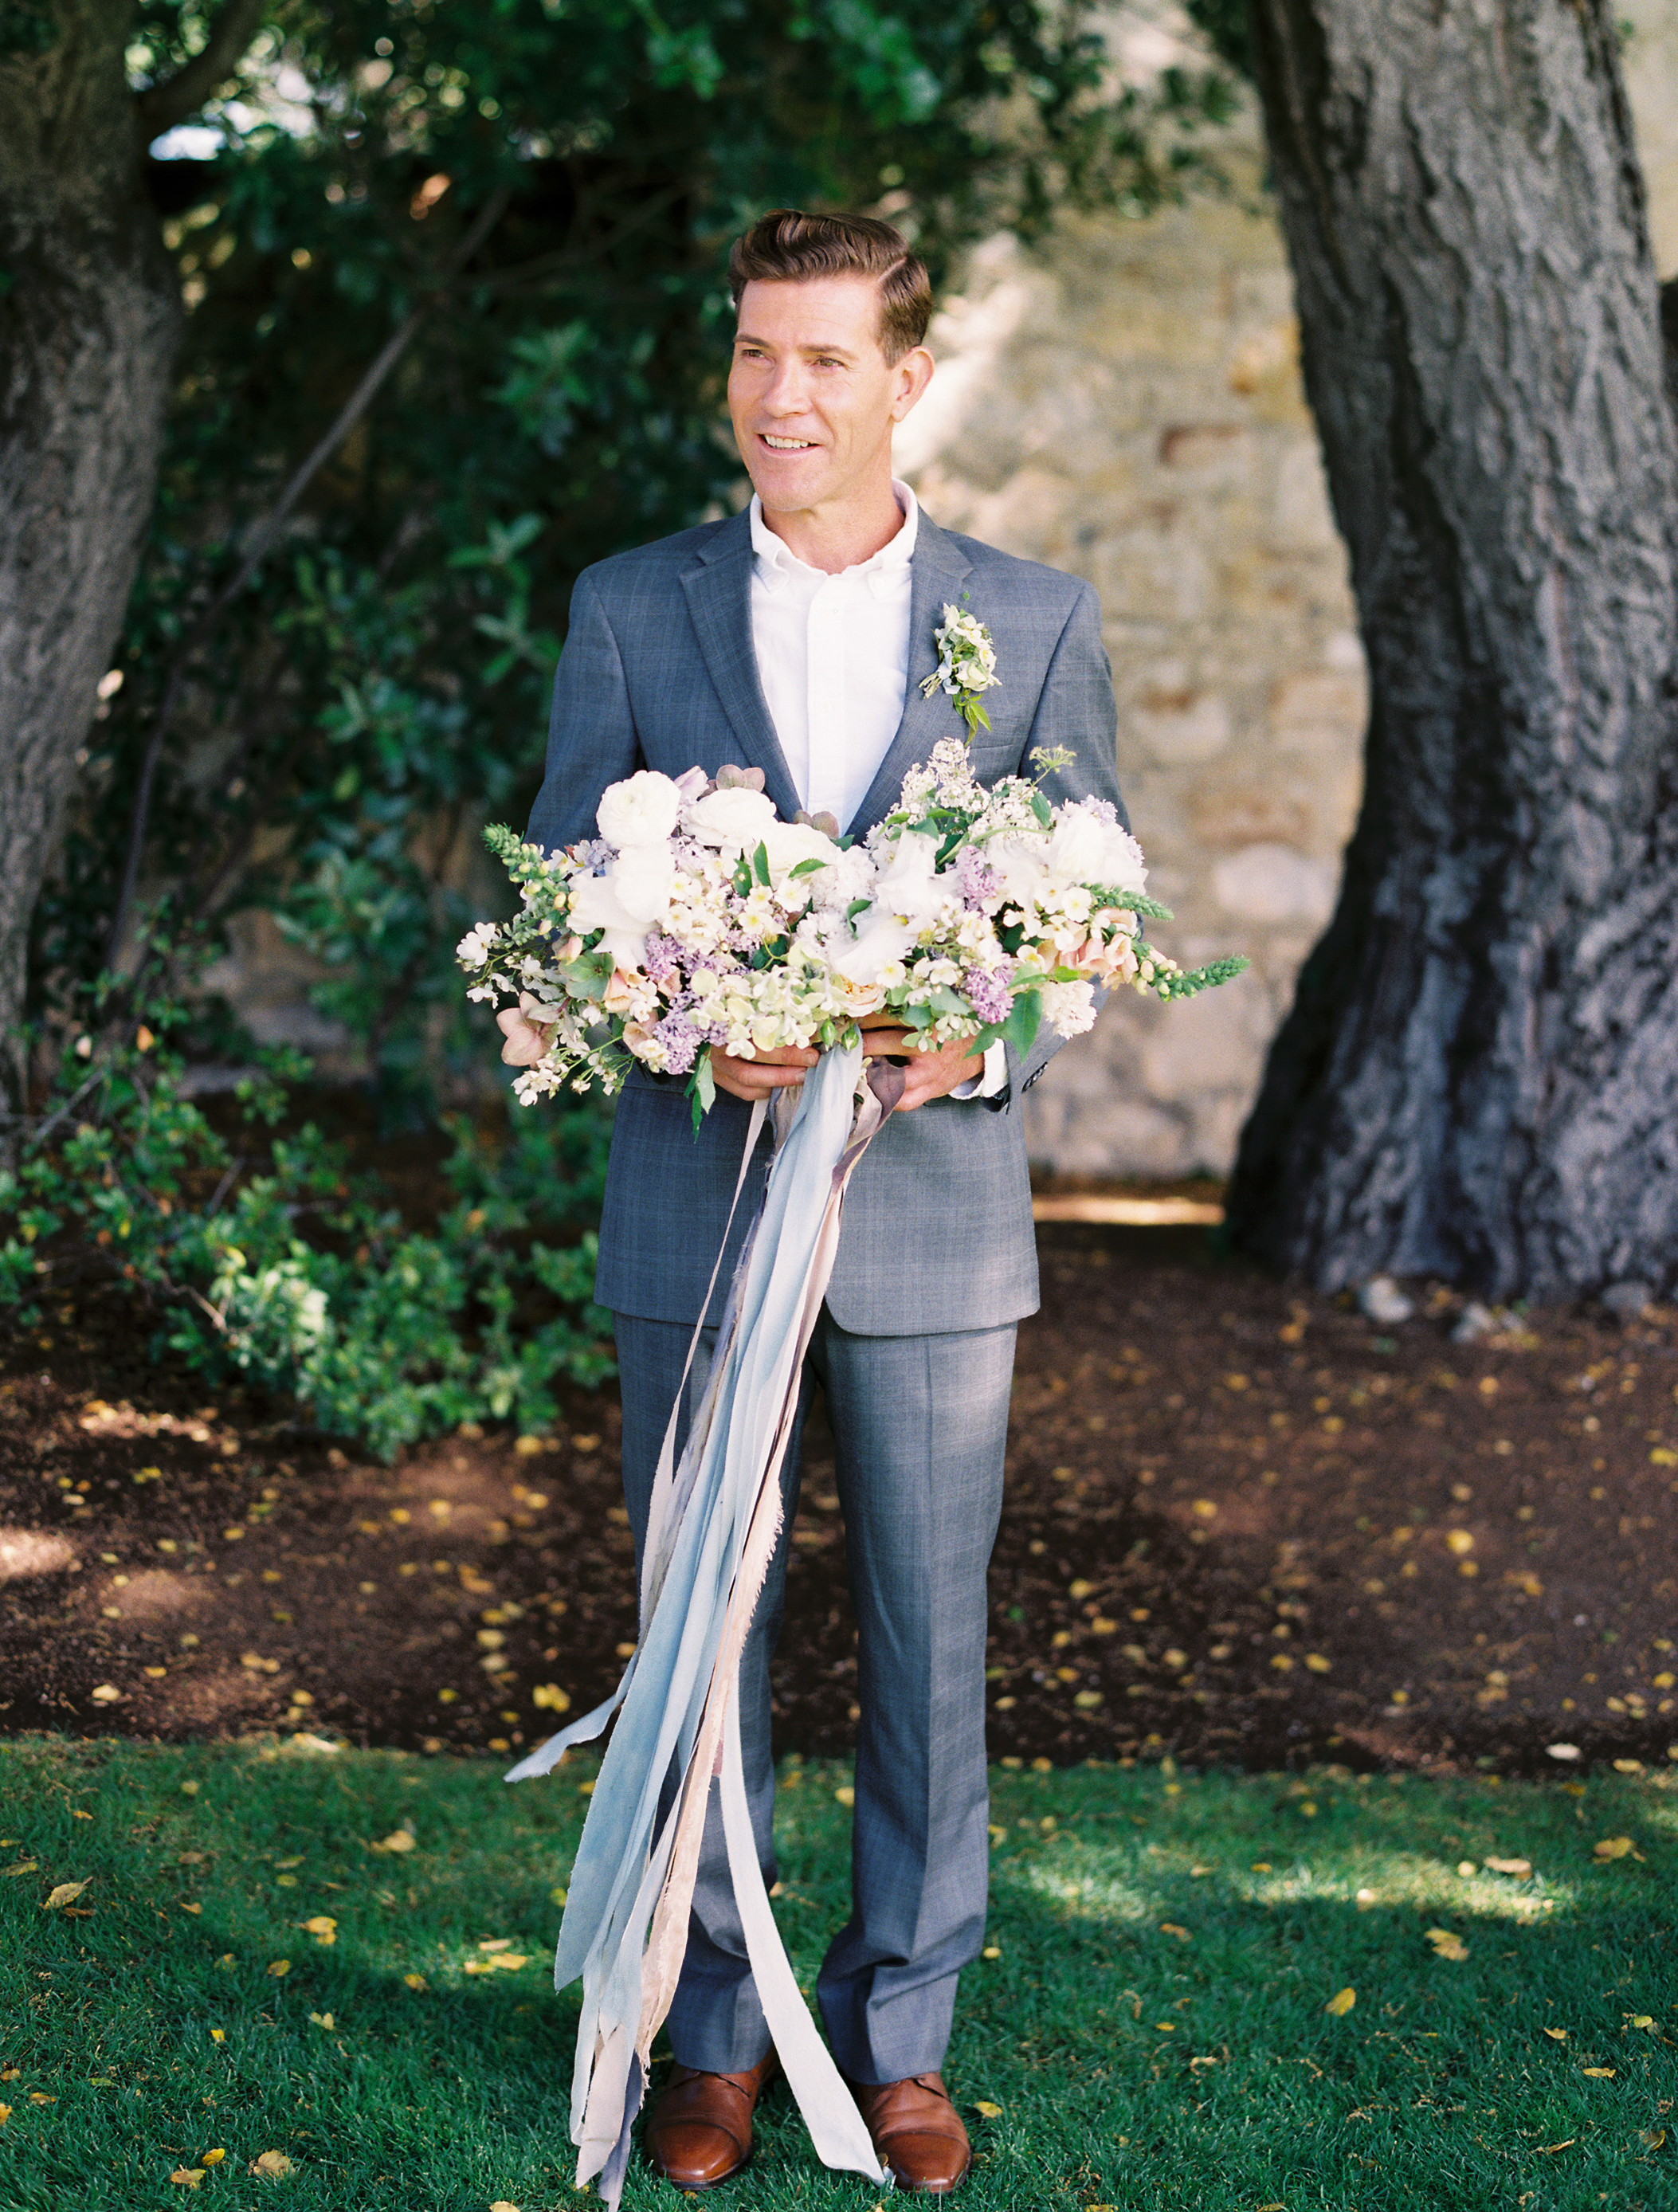 holman+ranch+wedding+bloom+workshop-36.jpg